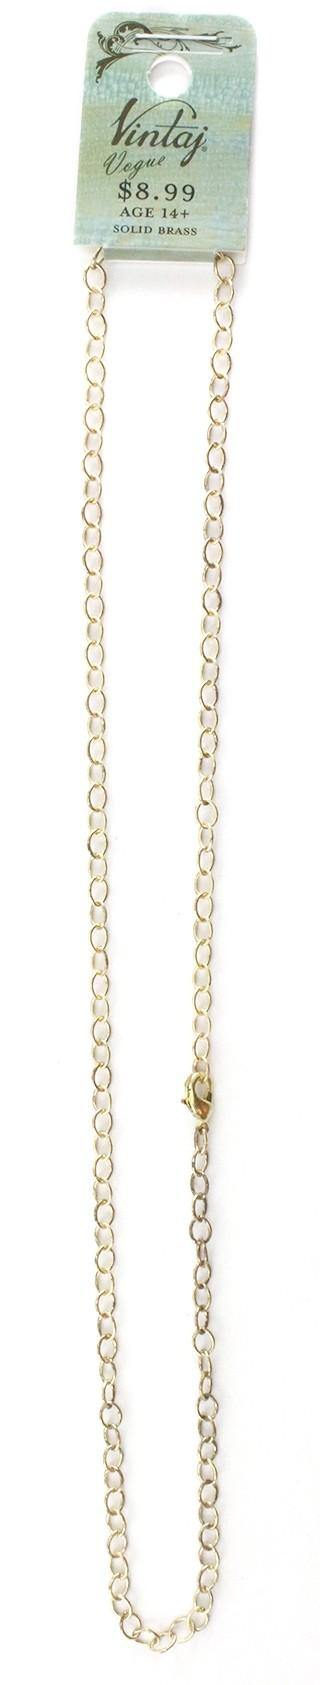 Vintaj Vogue Solid Brass 3.6x4.8mm Extra Fine Oval (soldered link) 18 inch Necklace 1